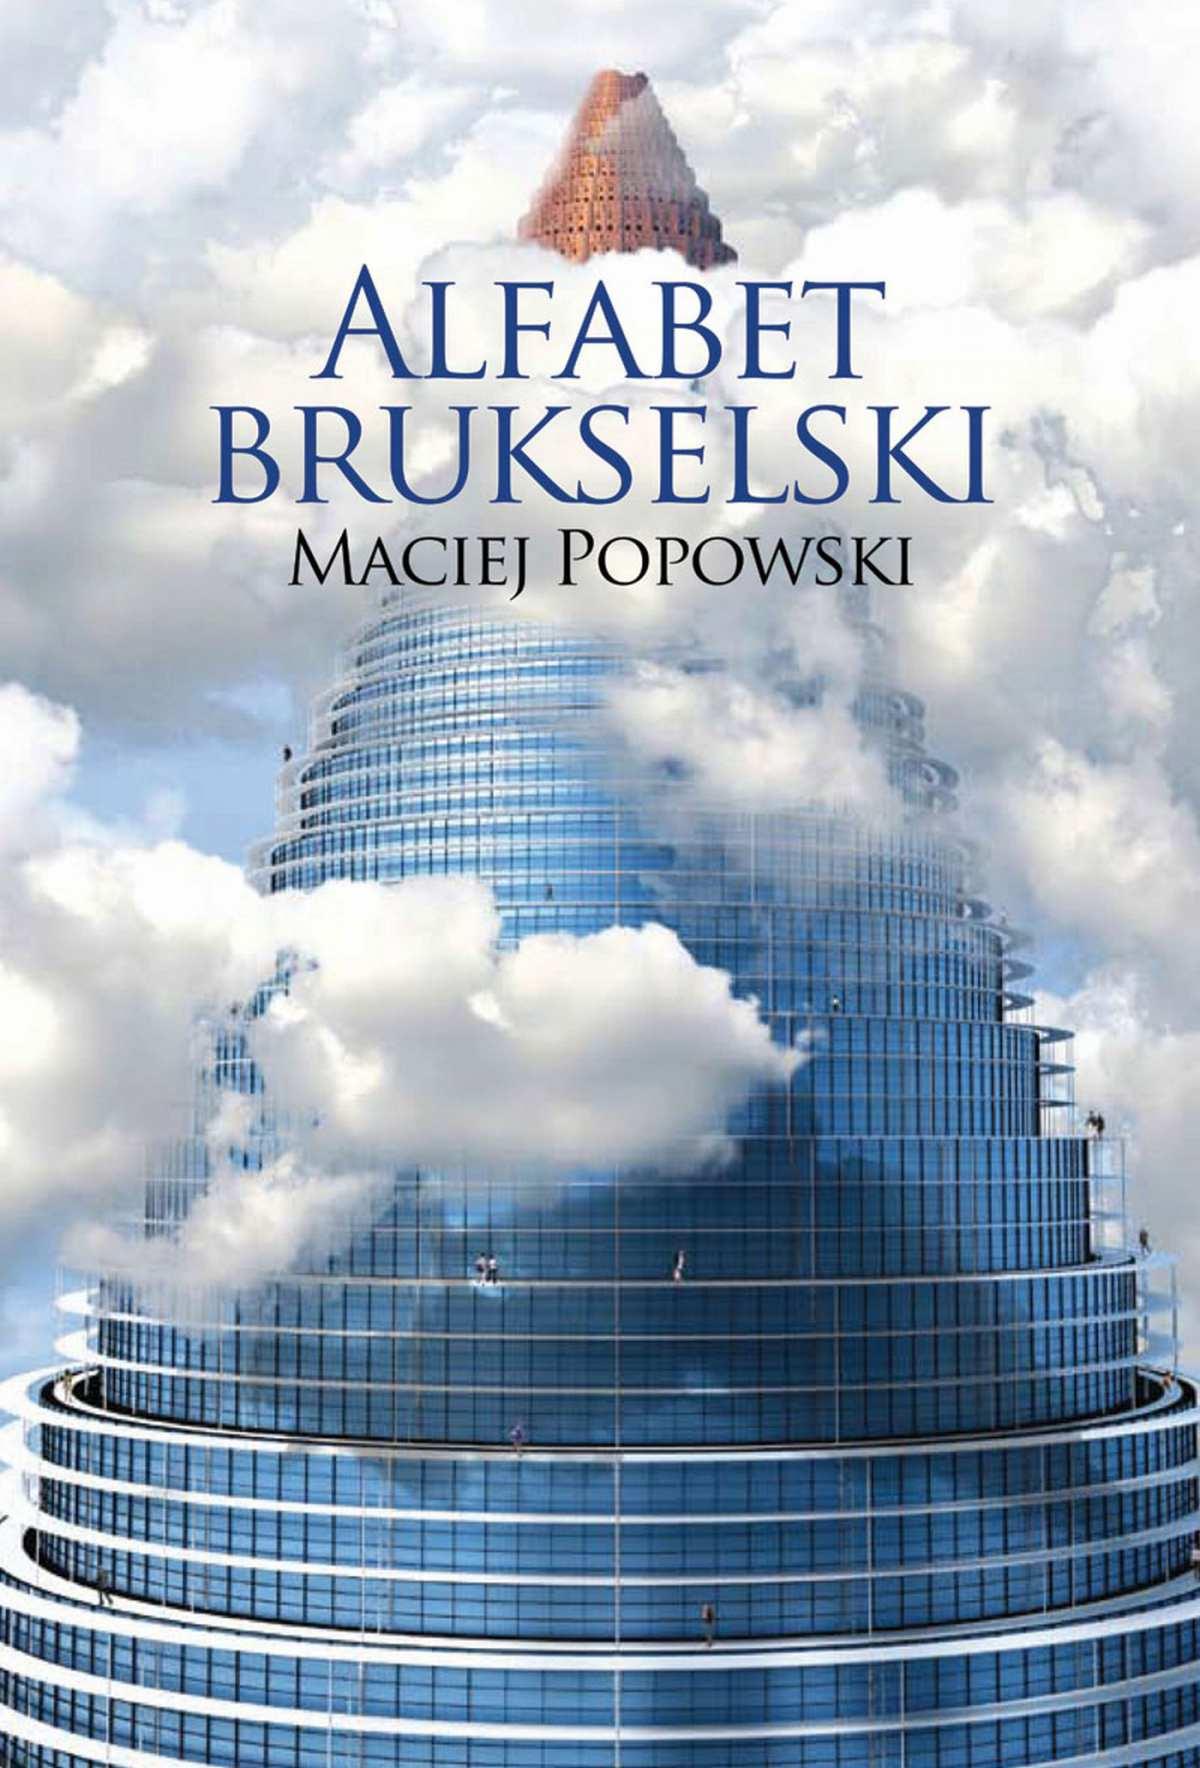 Alfabet brukselski - Ebook (Książka na Kindle) do pobrania w formacie MOBI